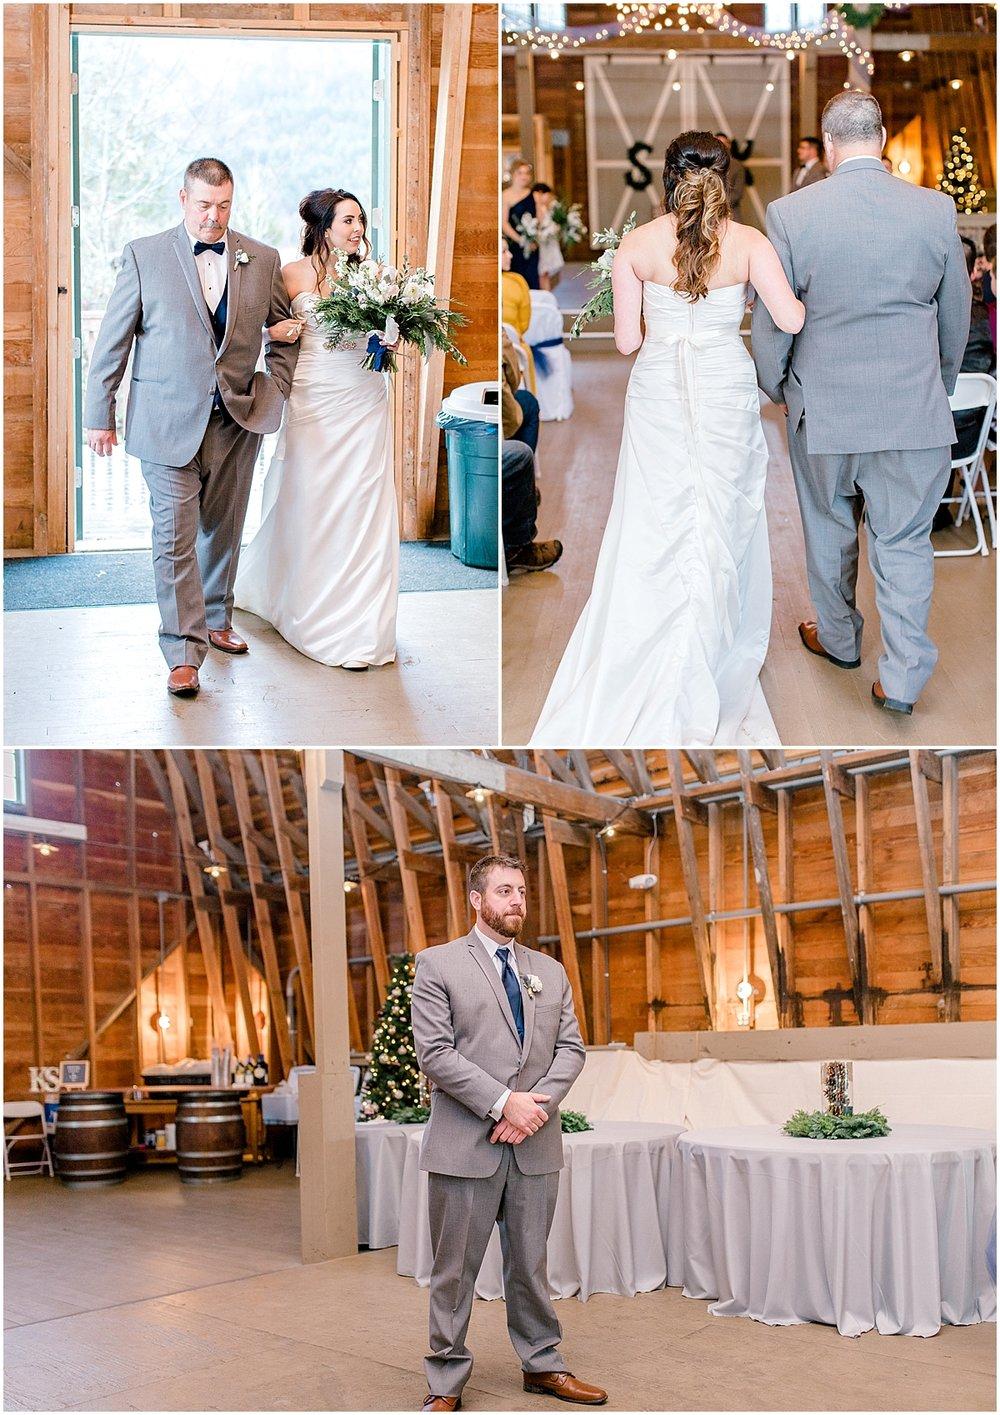 Chehalis Washington Winter Wedding Silver and White | Willapa Hills Farm Wedding | Eastham | Emma Rose Company PNW Light and Airy Wedding Photographer_0043.jpg